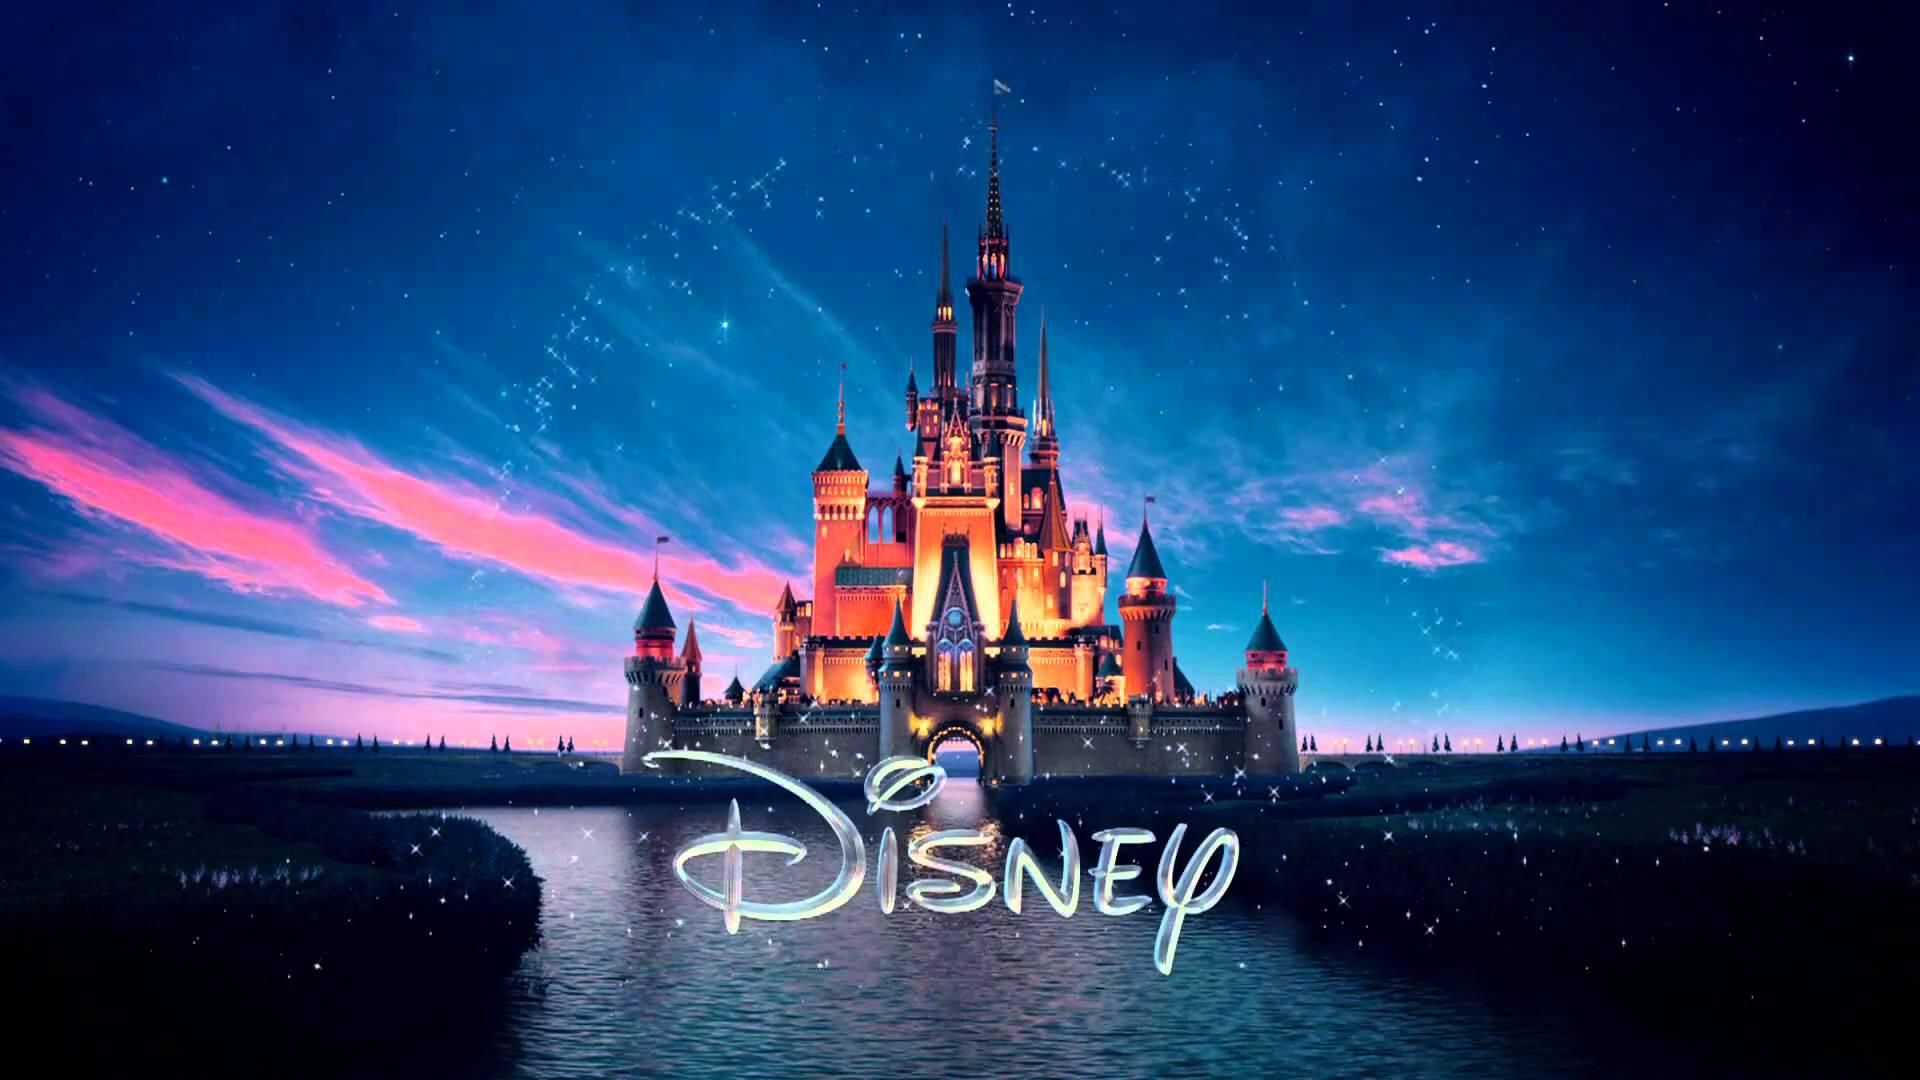 Disney Built a Blockchain